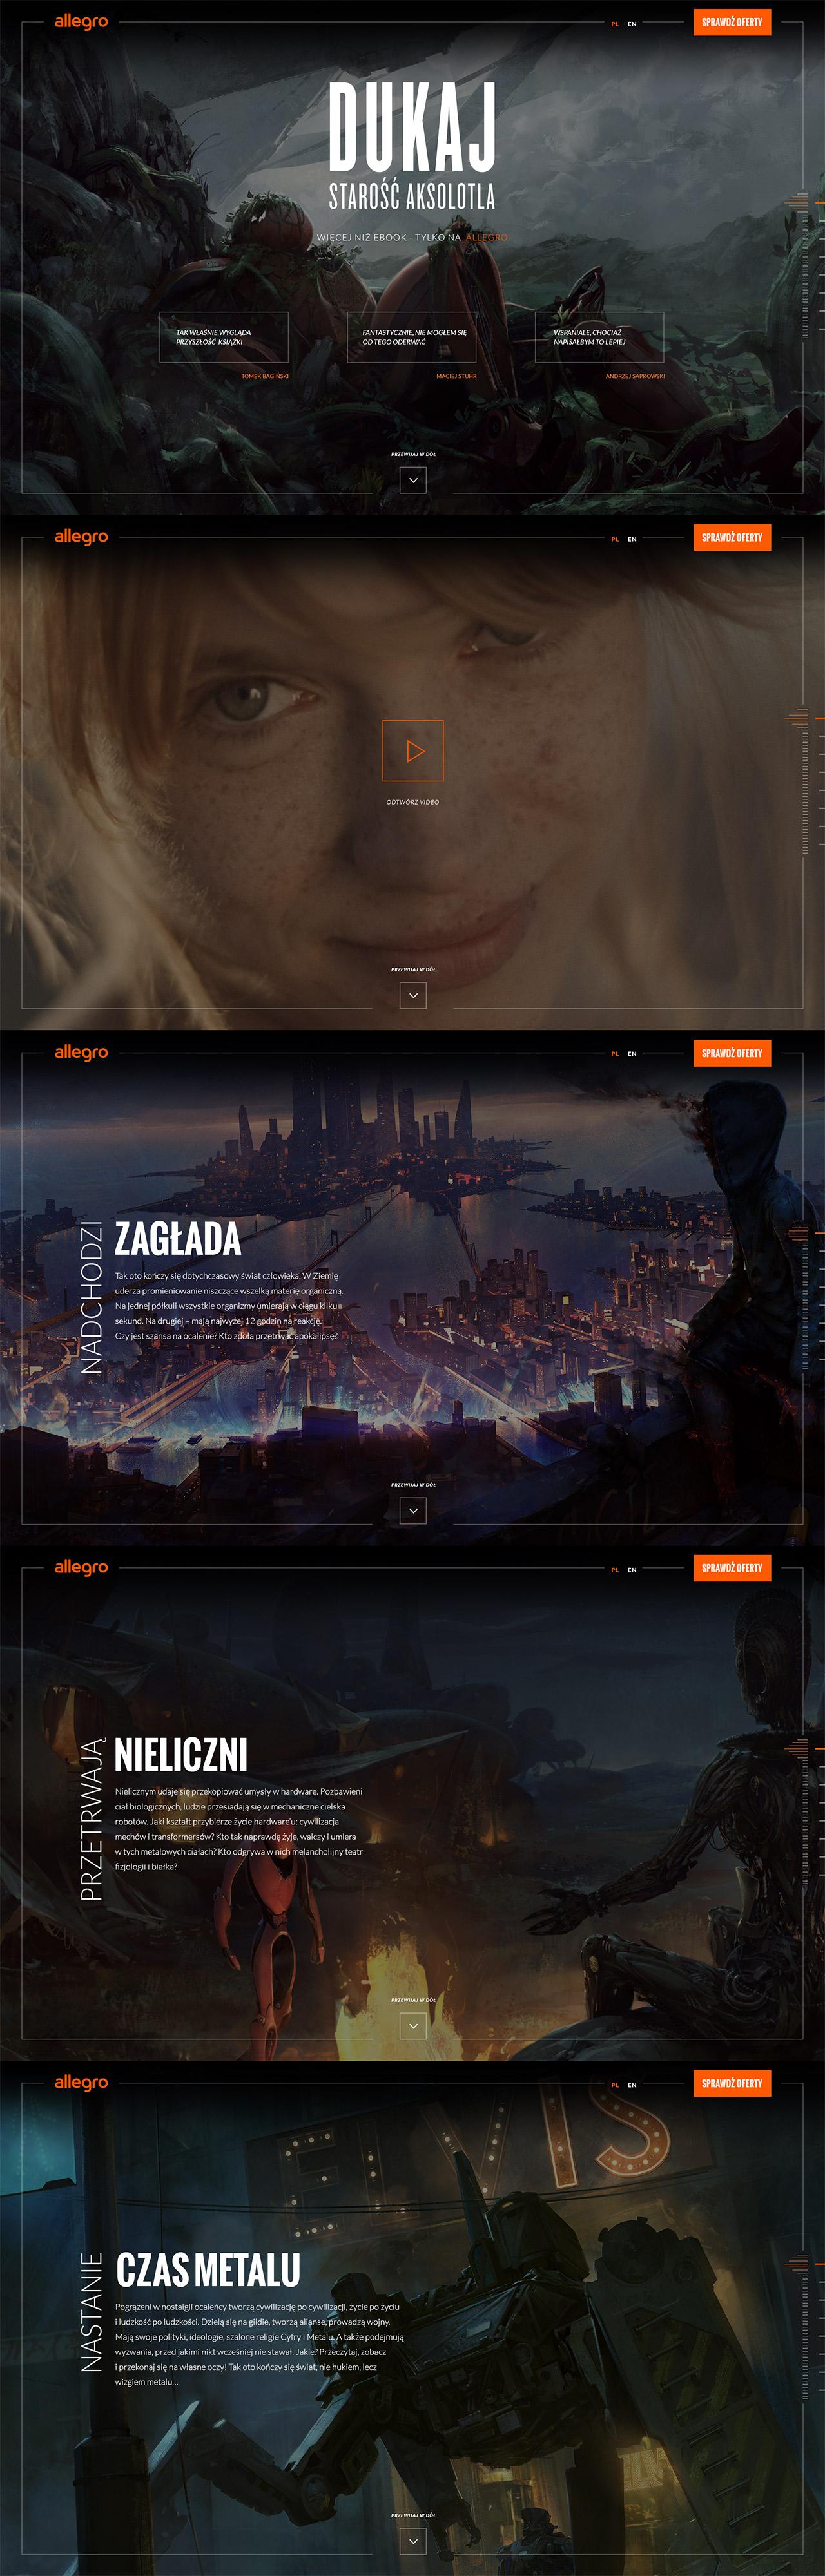 The Old Axolotl Website Screenshot